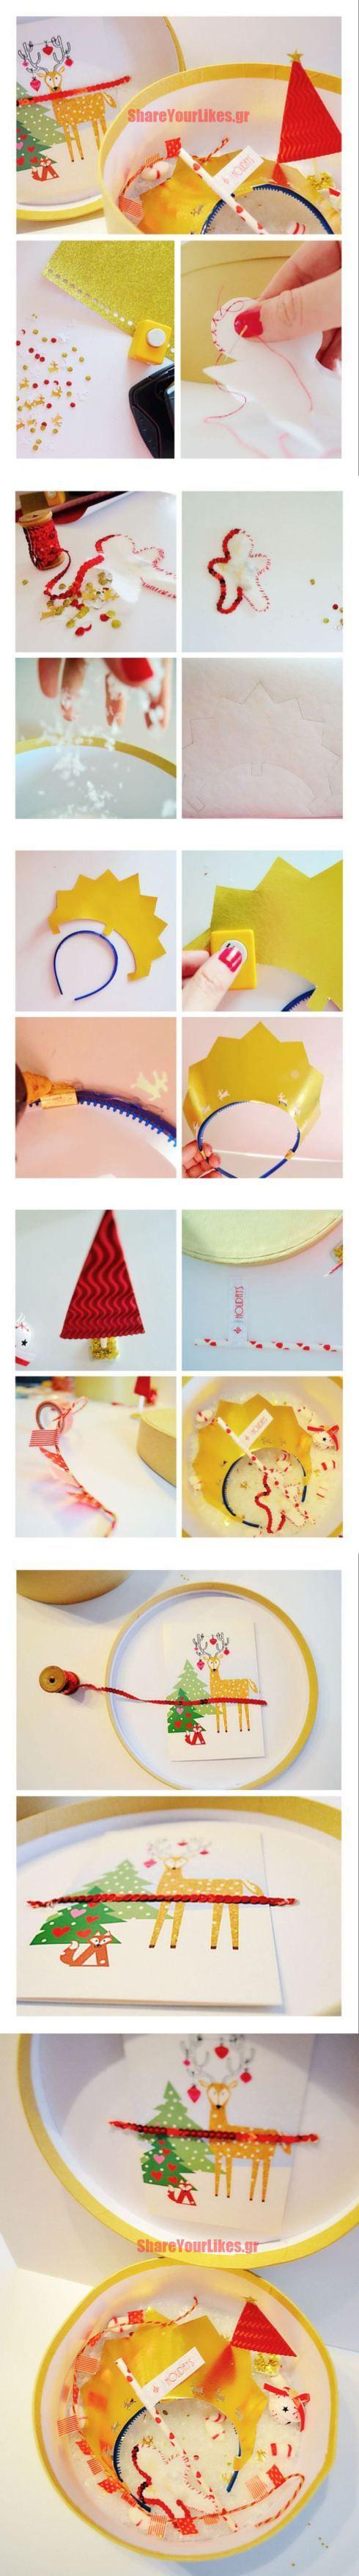 DIY: Παραμονή Πρωτοχρονιάς Στο...Κουτί!  #diy #shareyourlikes #xmas #newyearseve #christmas #ideas ShareYourLikes.gr